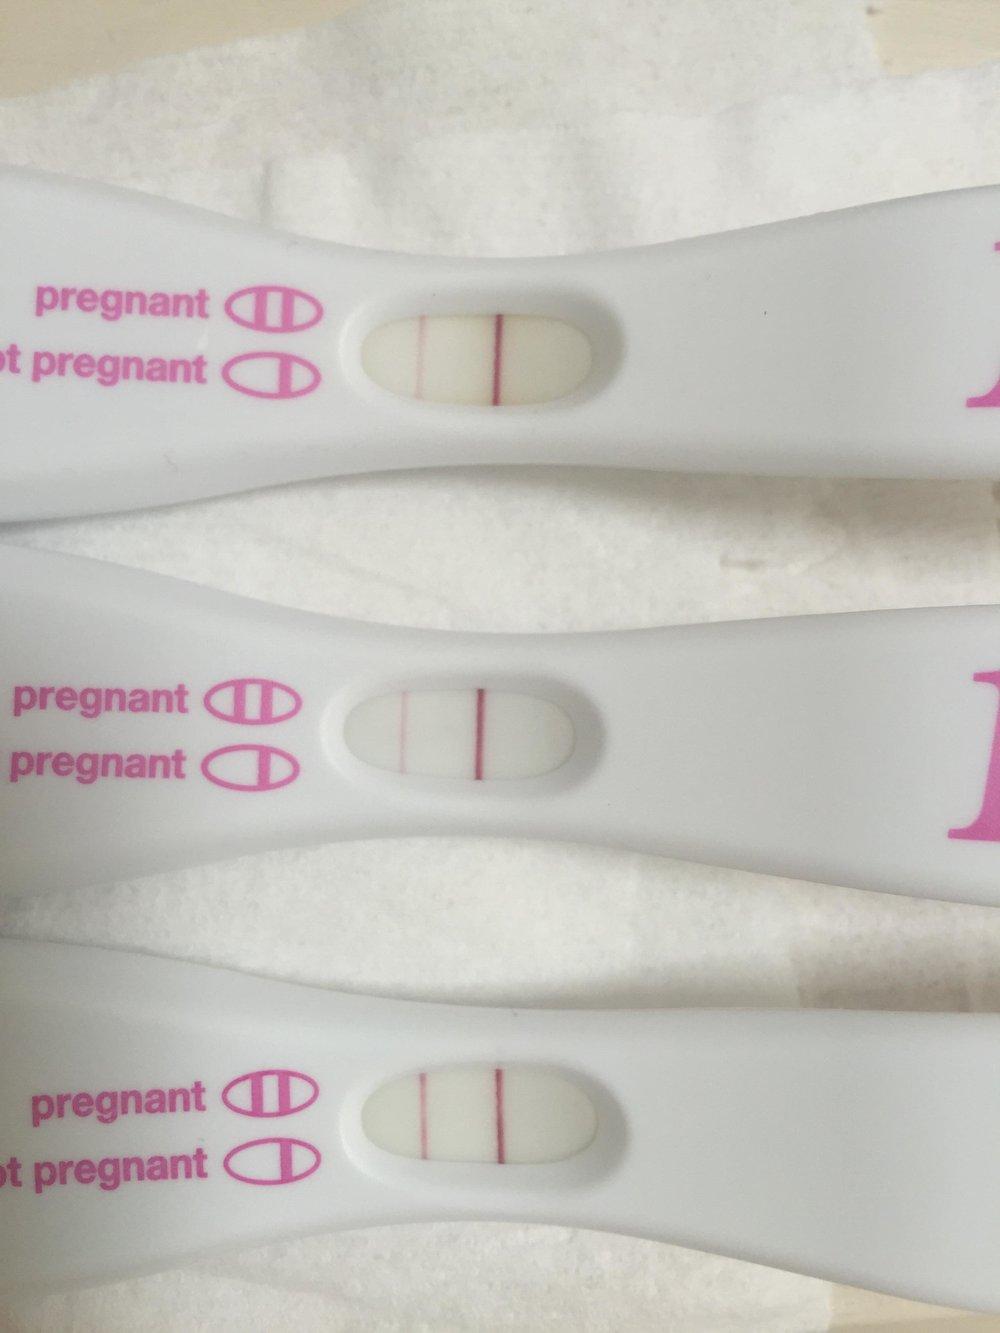 Pregnancy tests.jpg